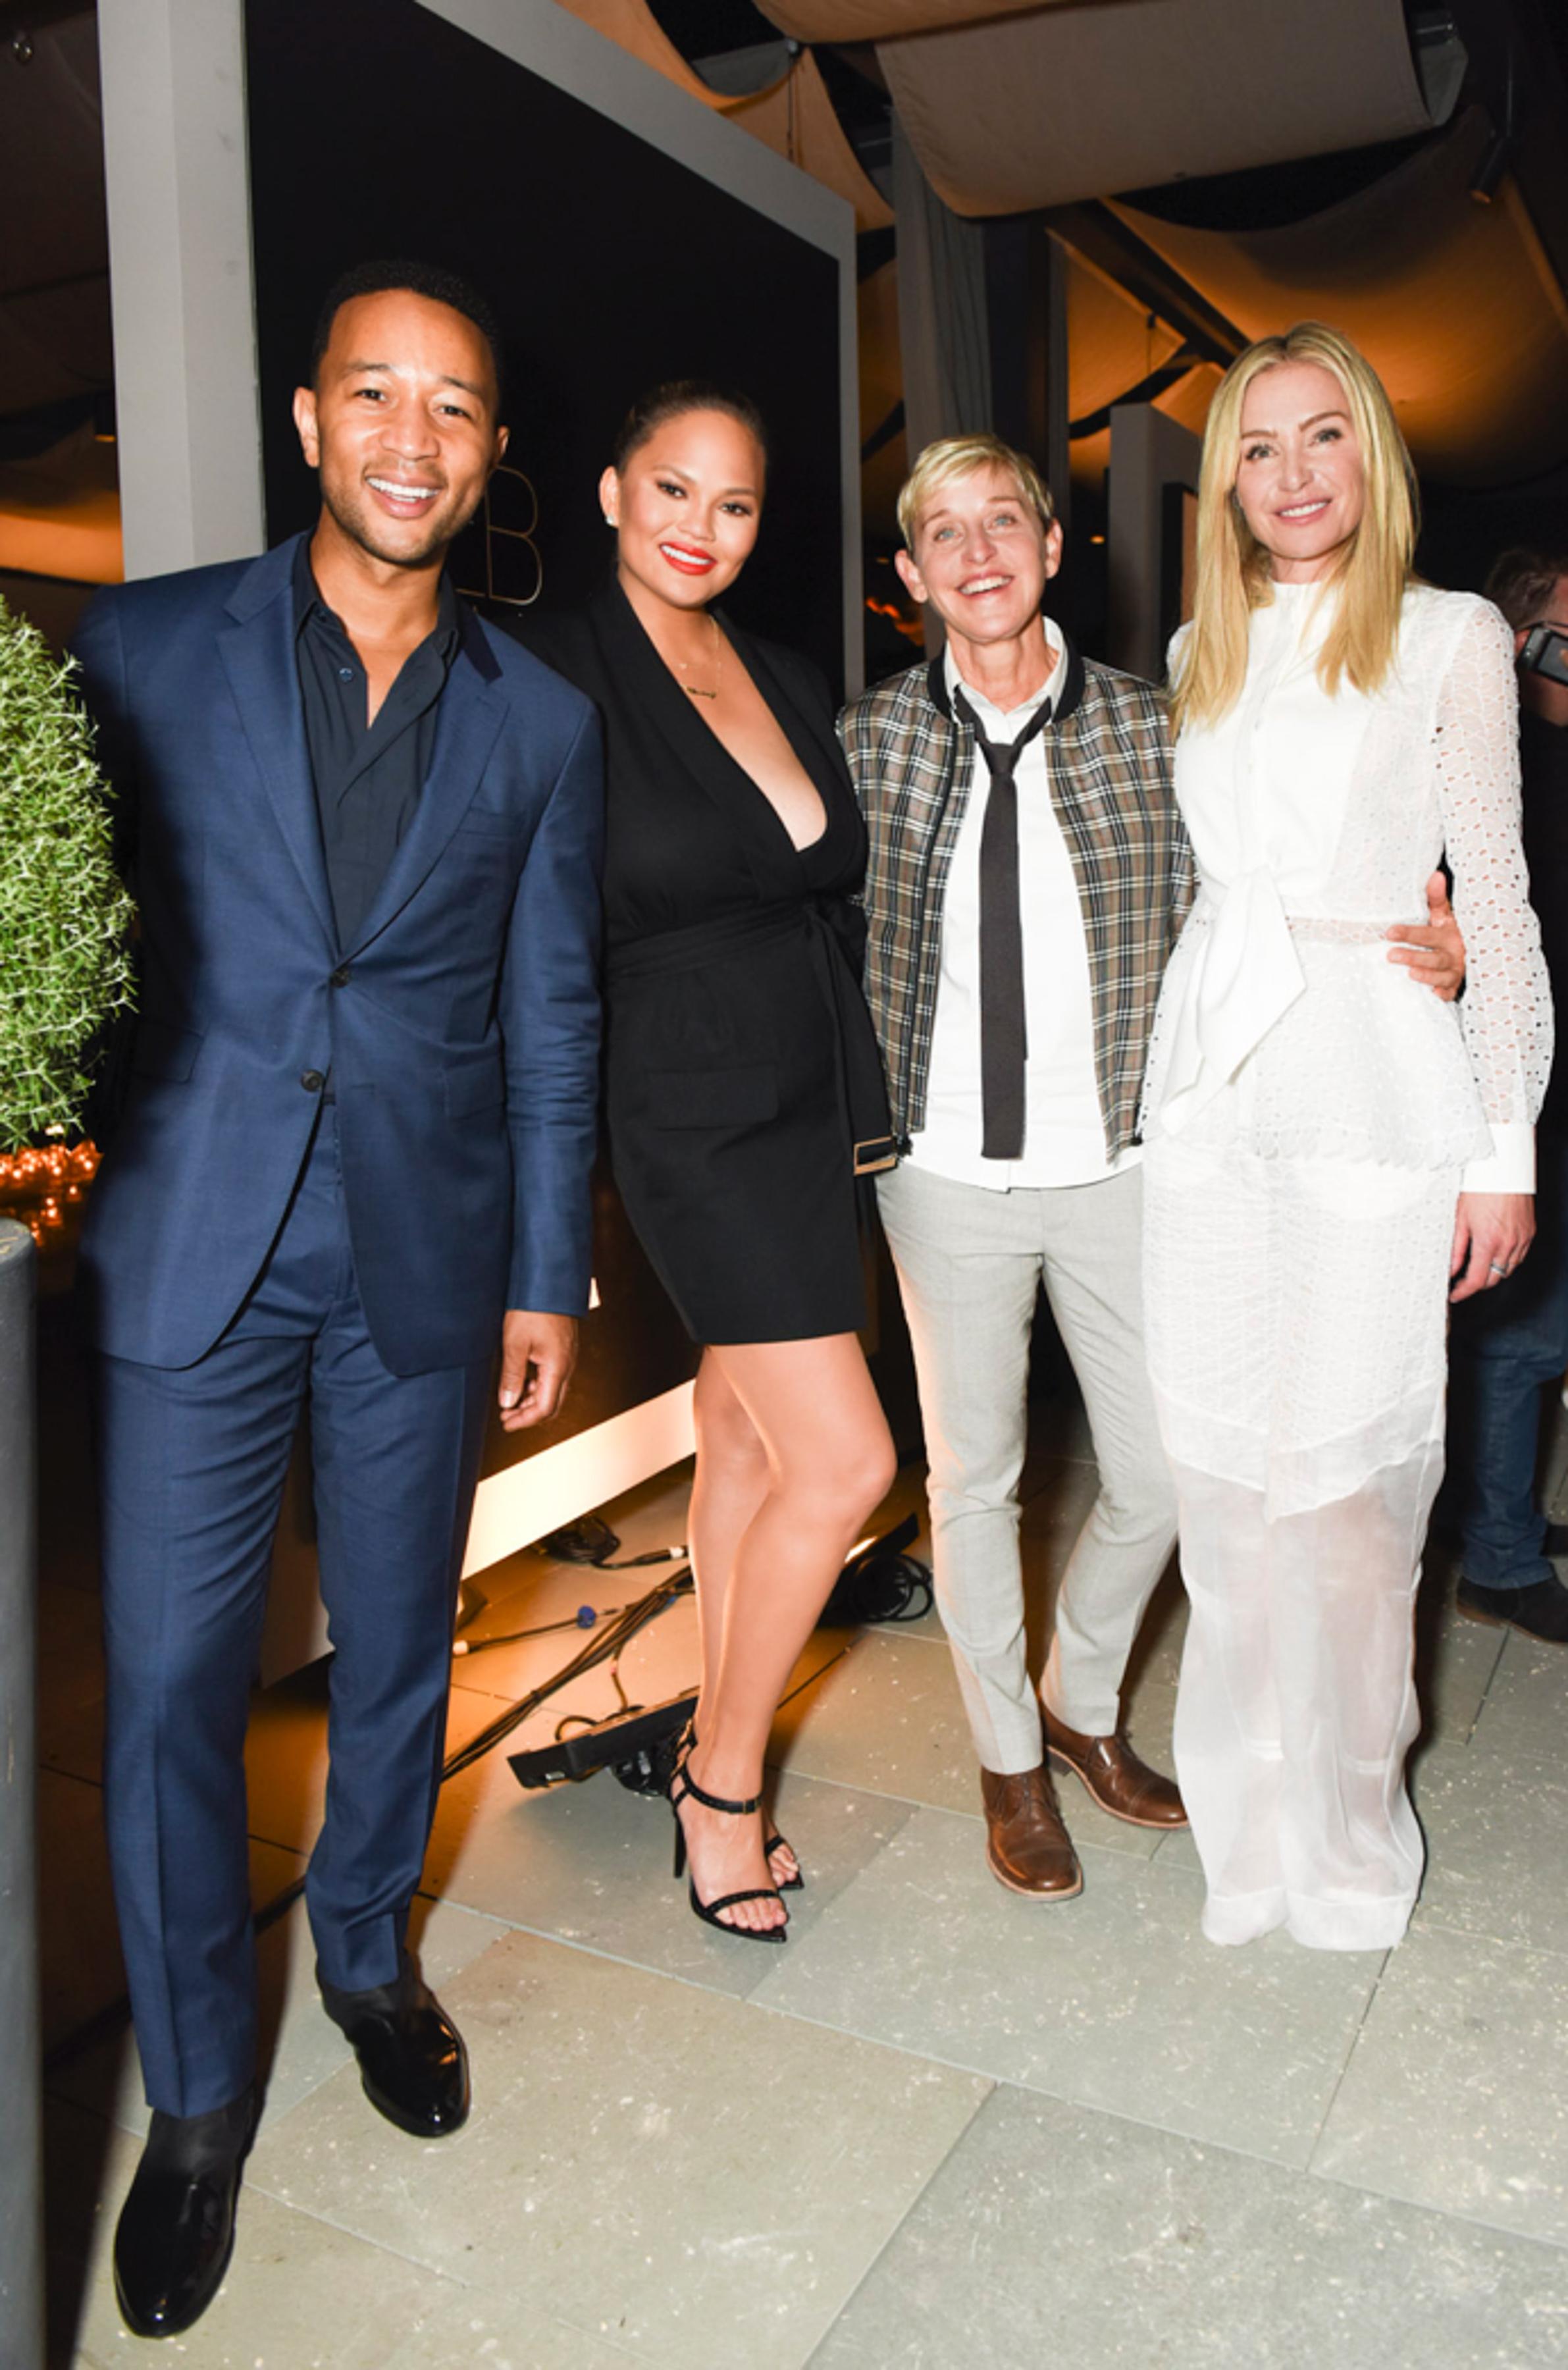 John Legend, Chrissy Teigen, Ellen DeGeneres, Portia de RossiGeneral Public x RH celebration, California, USA - 27 Jun 2018